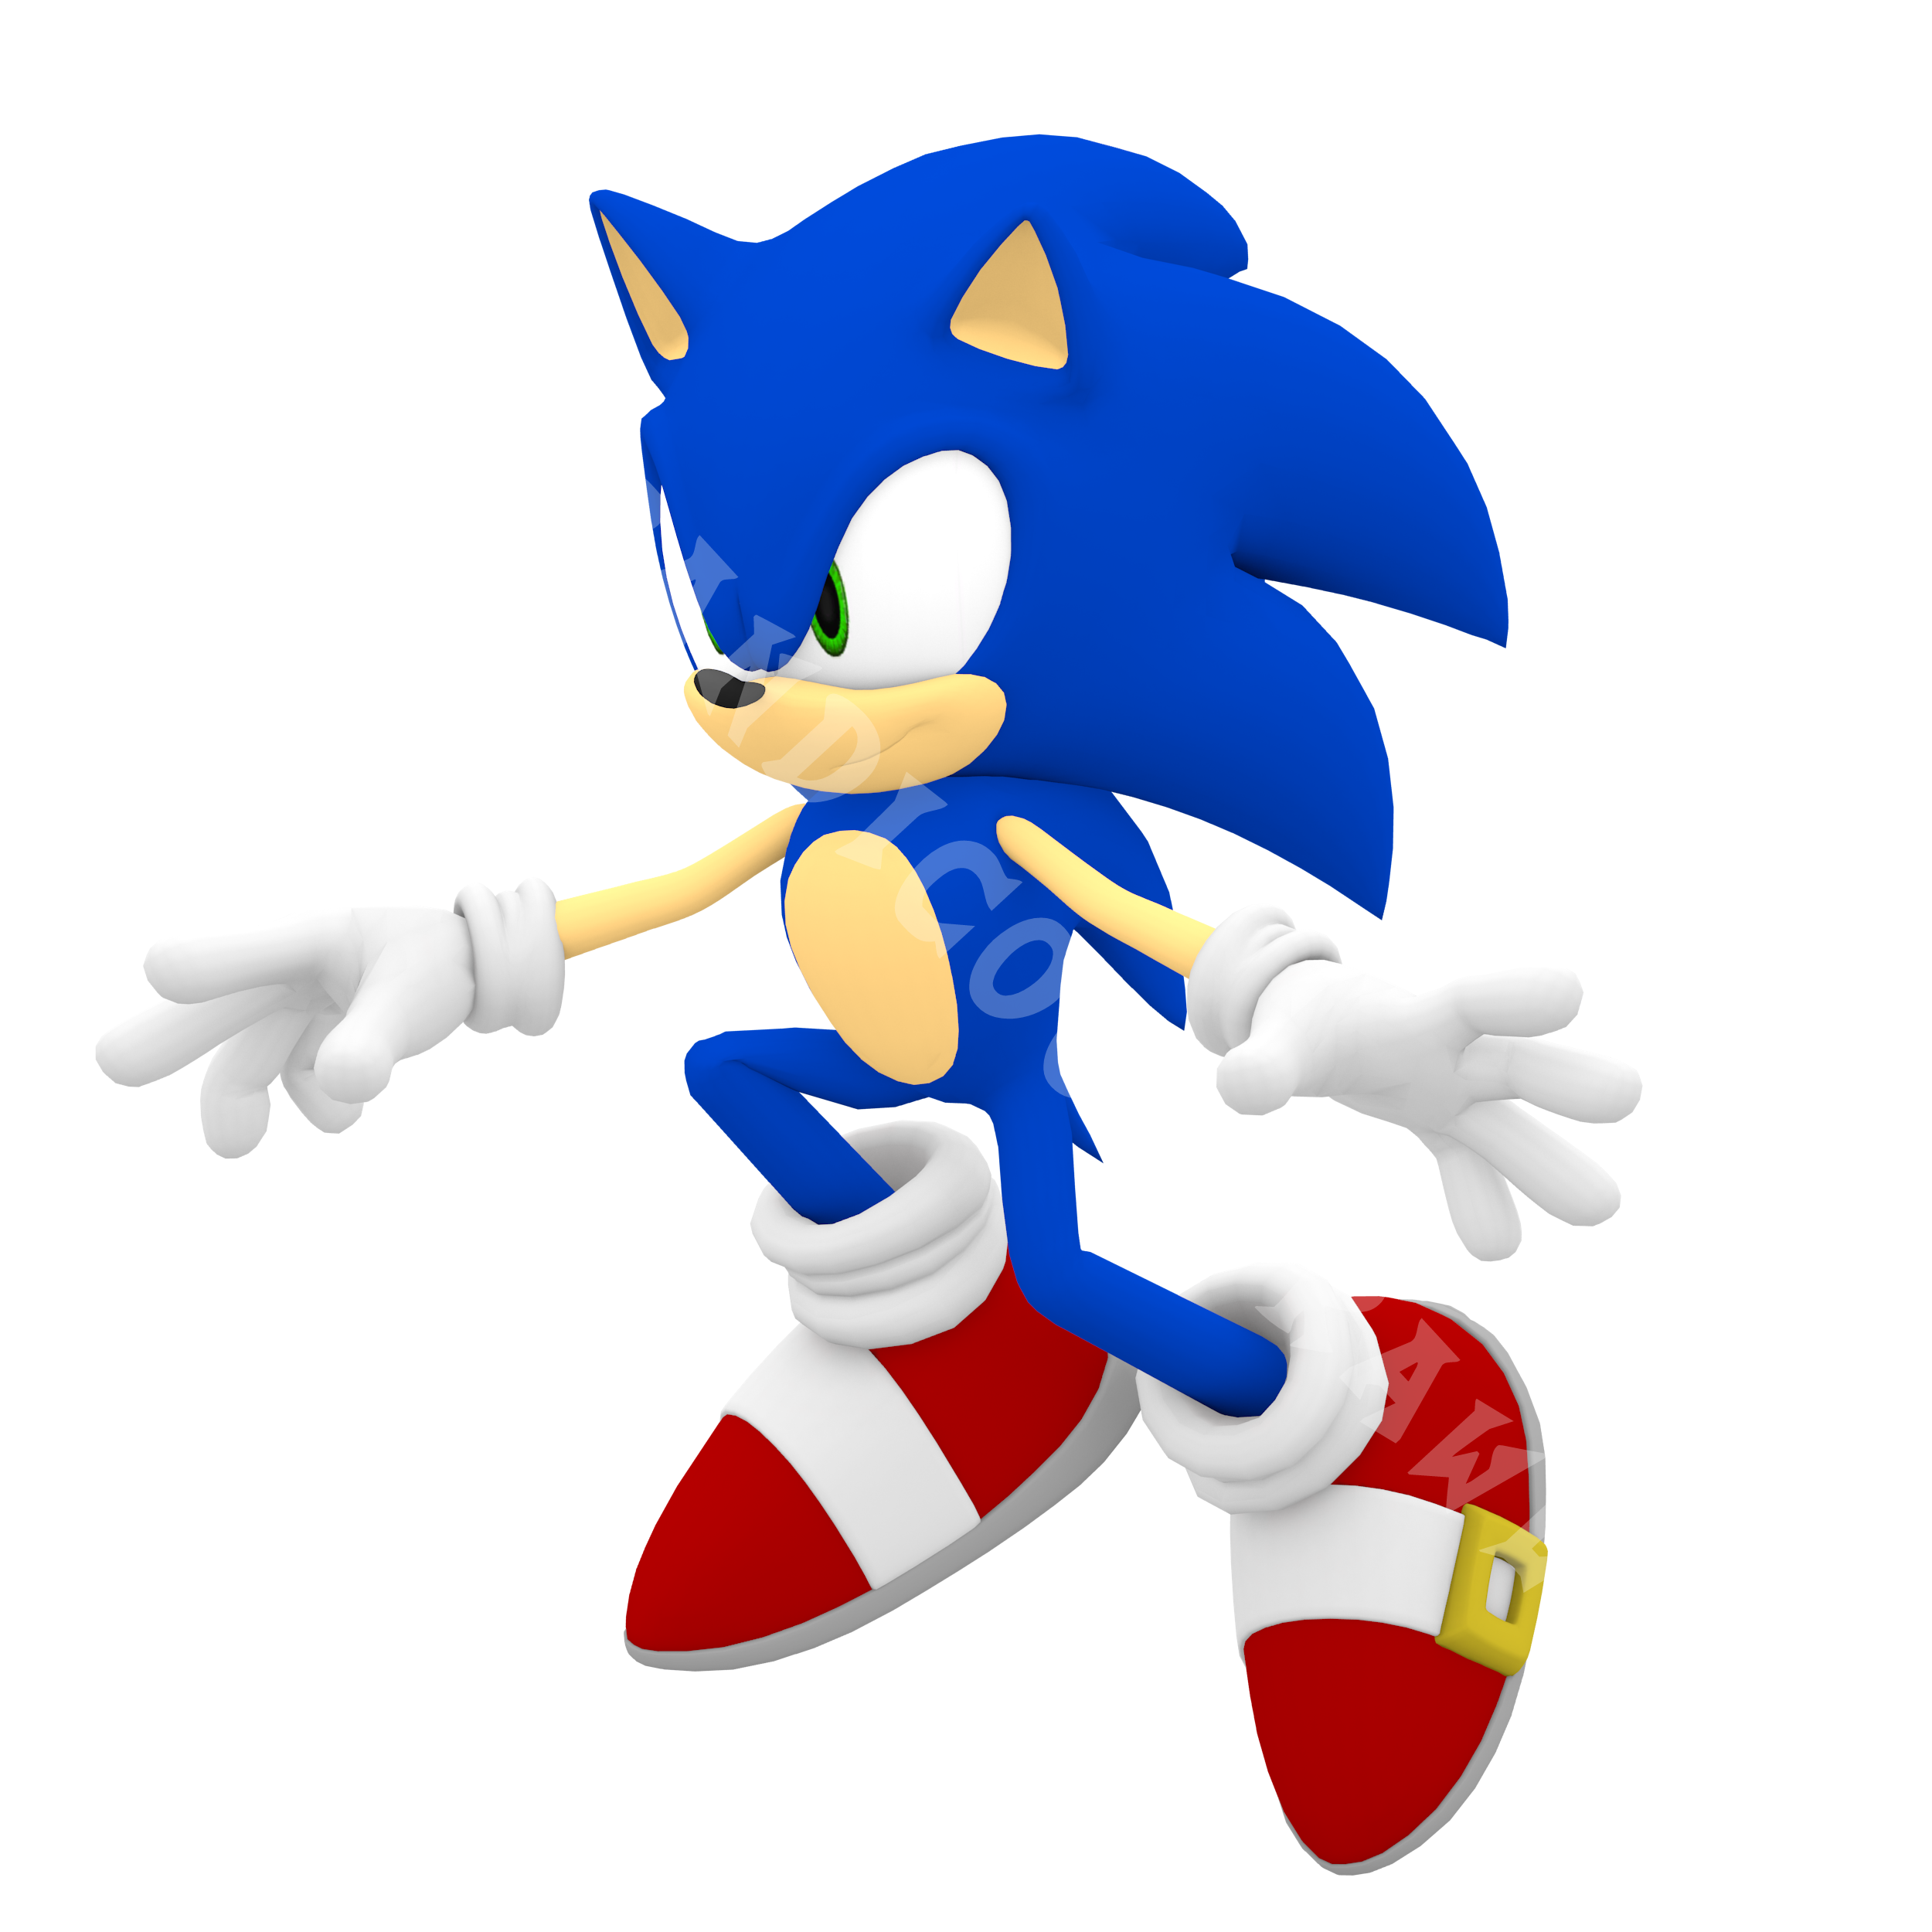 Old Modern Sonic Sonic 06 Cg Pose 1 By Bandicootbrawl96 On Deviantart